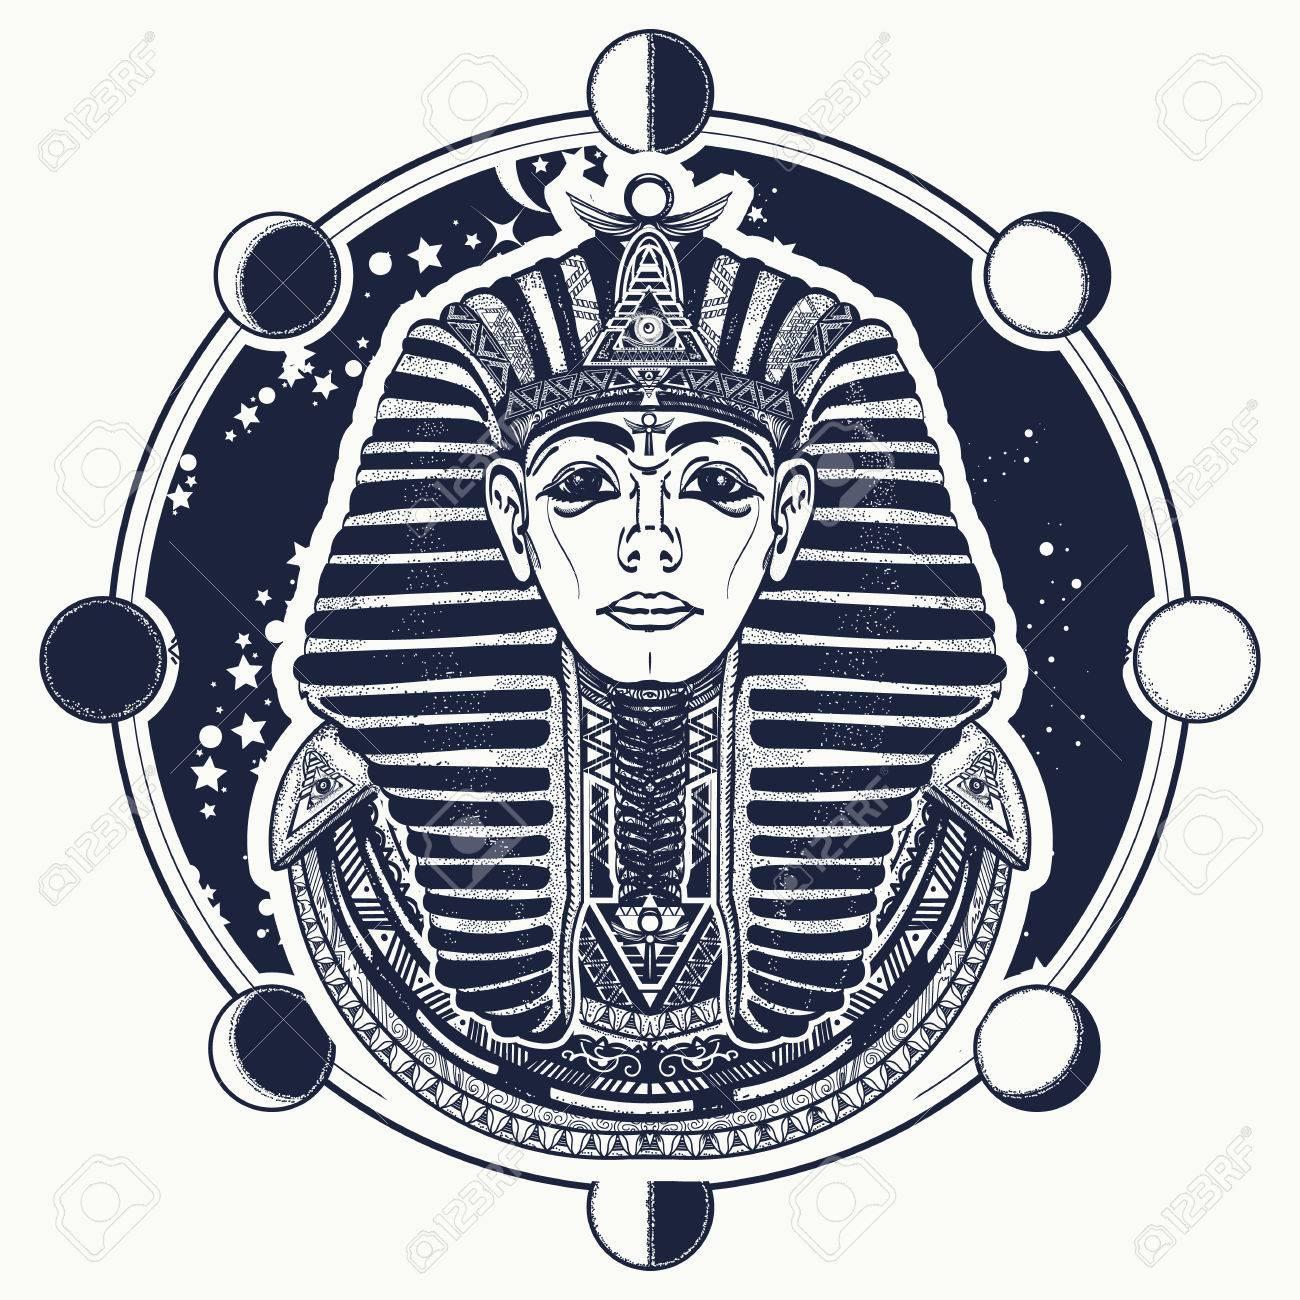 1300x1300 Pharaoh Vector Tattoo Art, Egypt Pharaoh Graphic, T Shirt Design